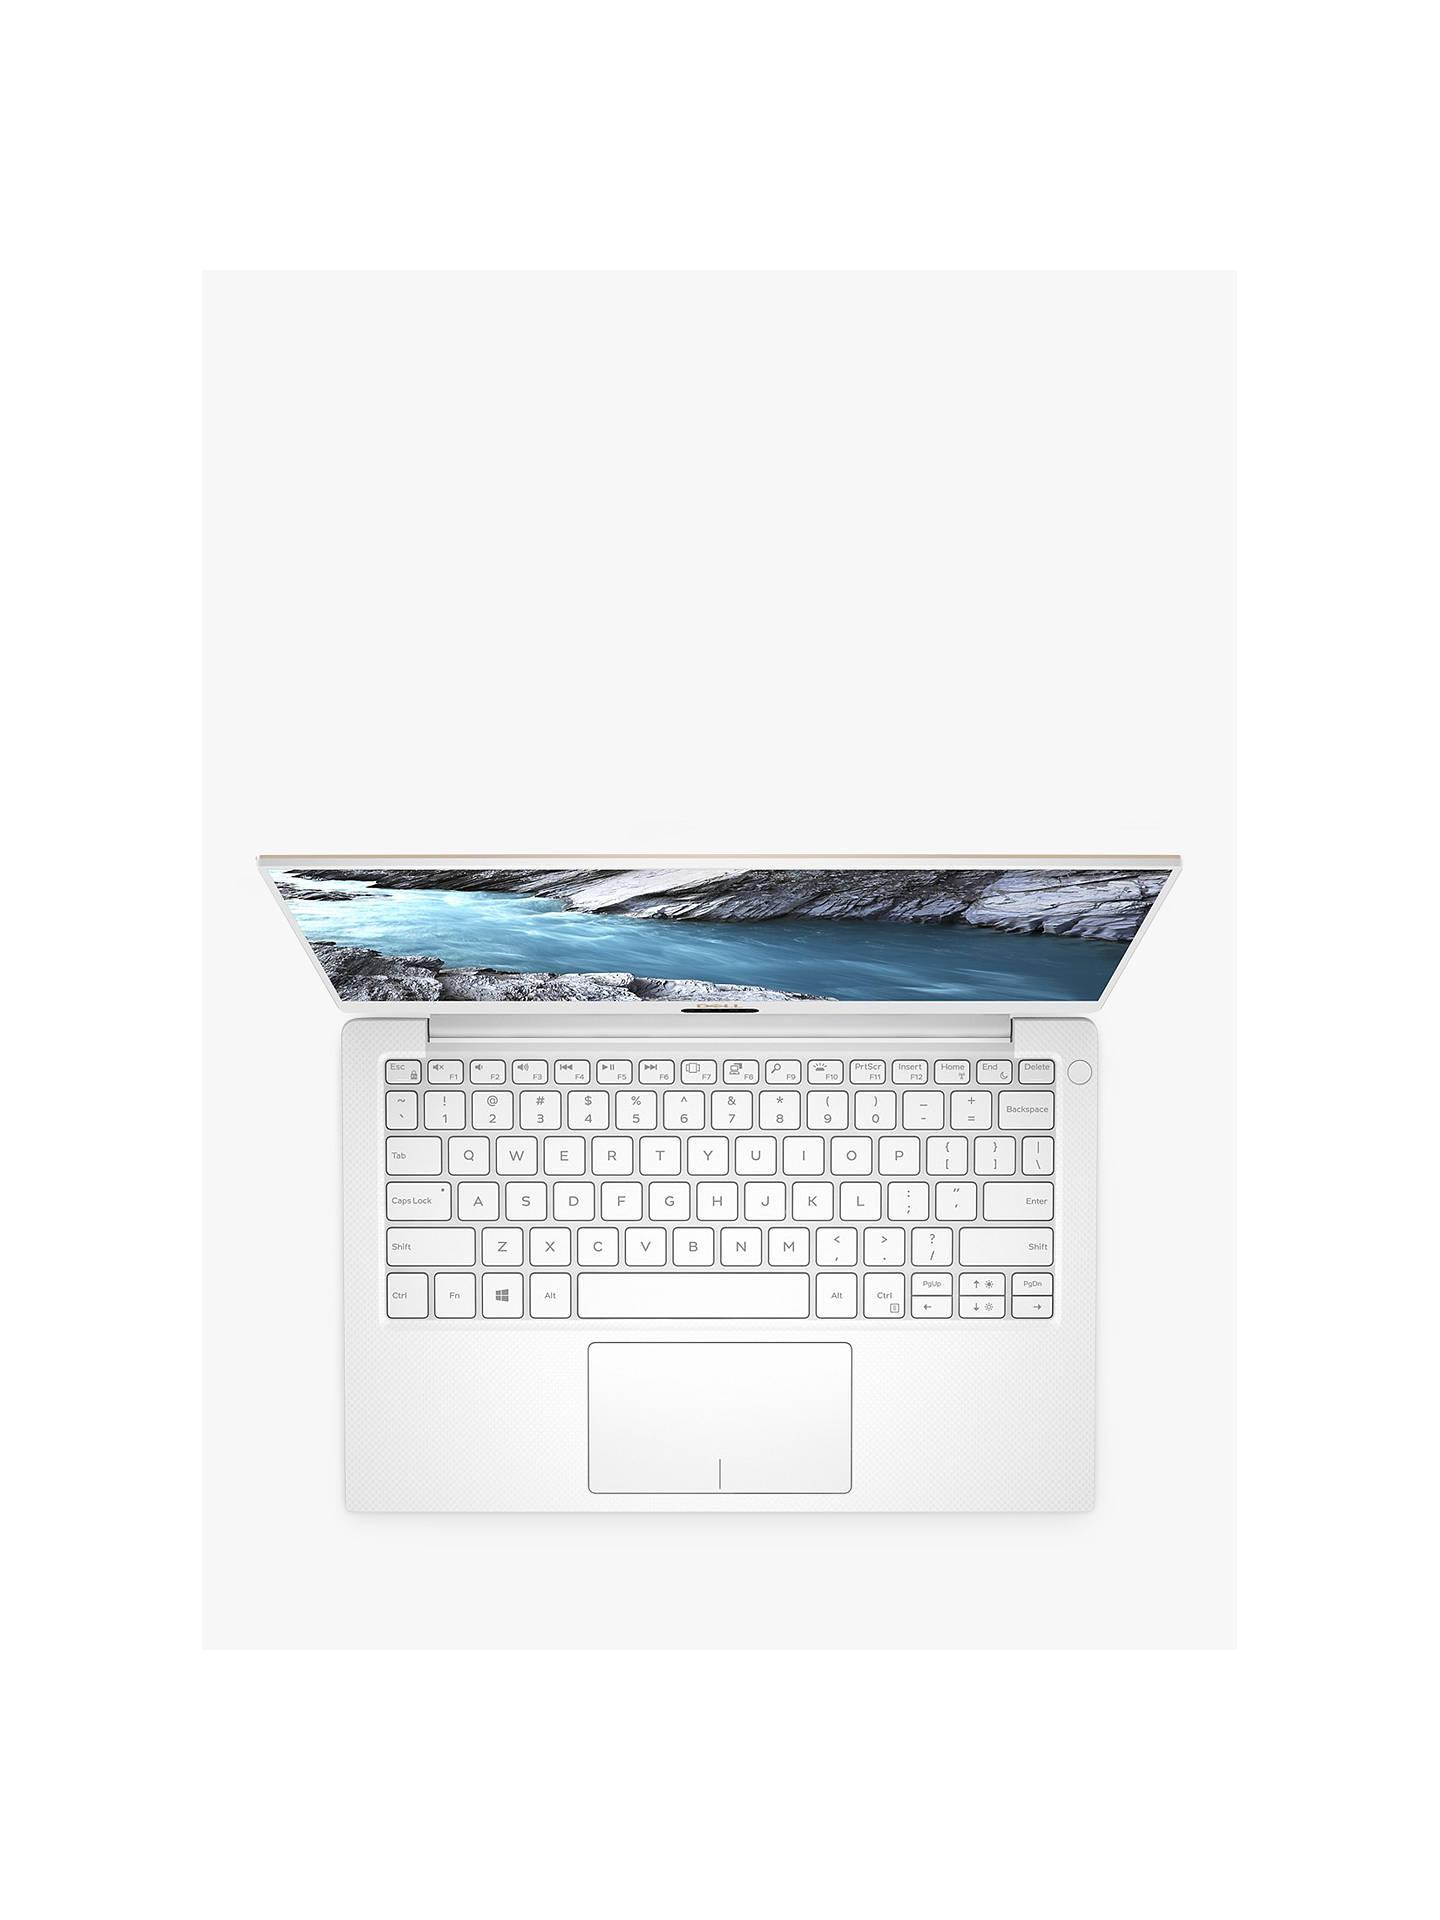 Dell XPS 13 9370 Laptop, Intel Core i7, 16GB RAM, 512GB SSD, 13 3